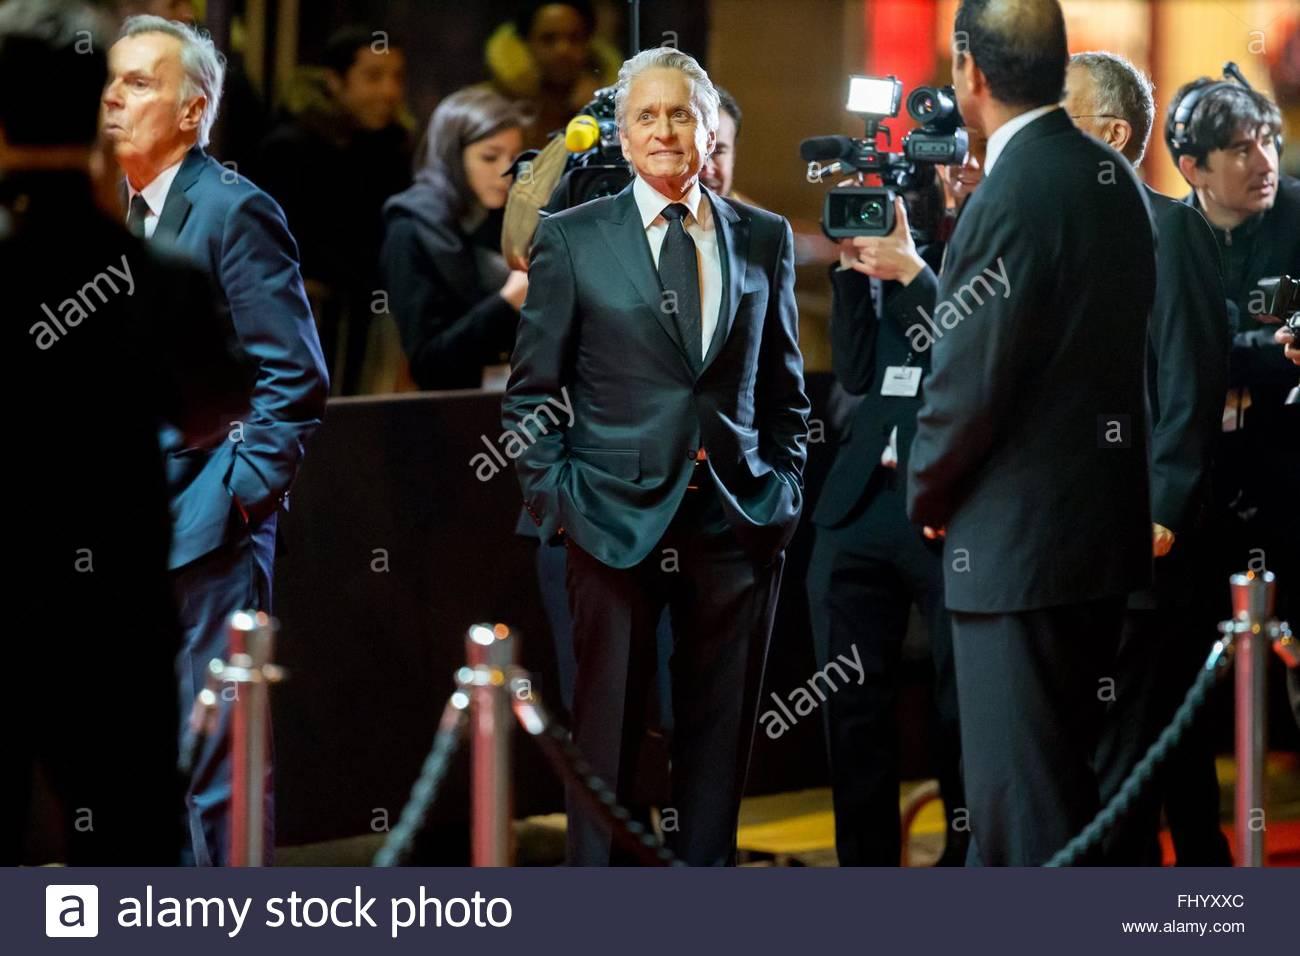 Paris, France. February 26th, 2016. FRANCE, Paris: US actor Michael Douglas walks on the red carpet of the 41st Stock Photo